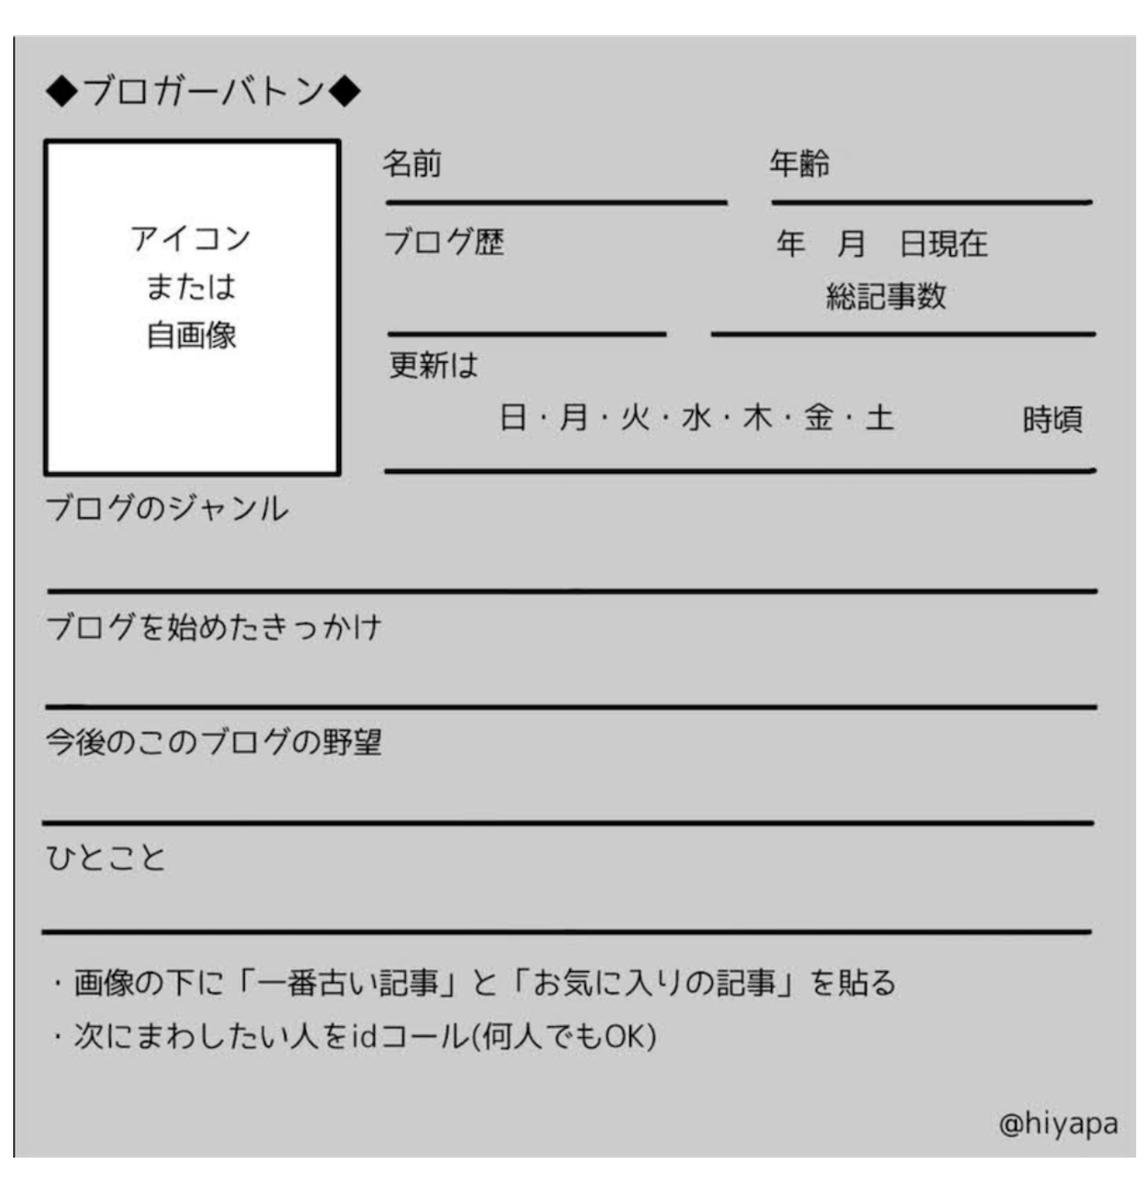 f:id:dsupplying:20200722082612p:plain